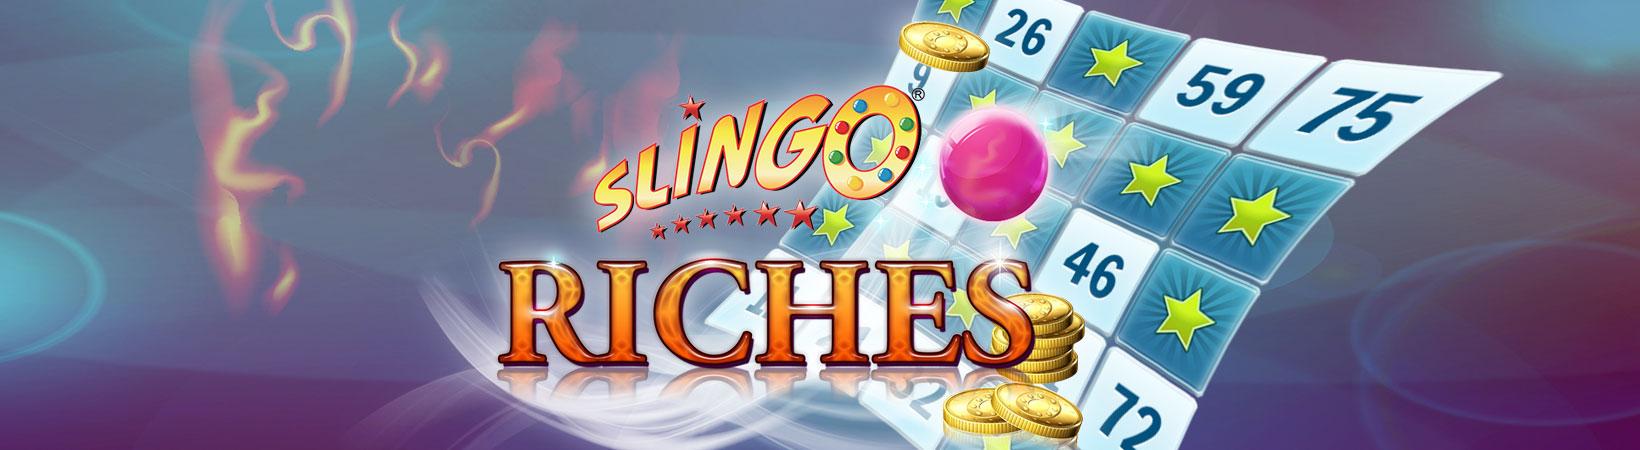 Slingo Riches Slot Logo Umbingo